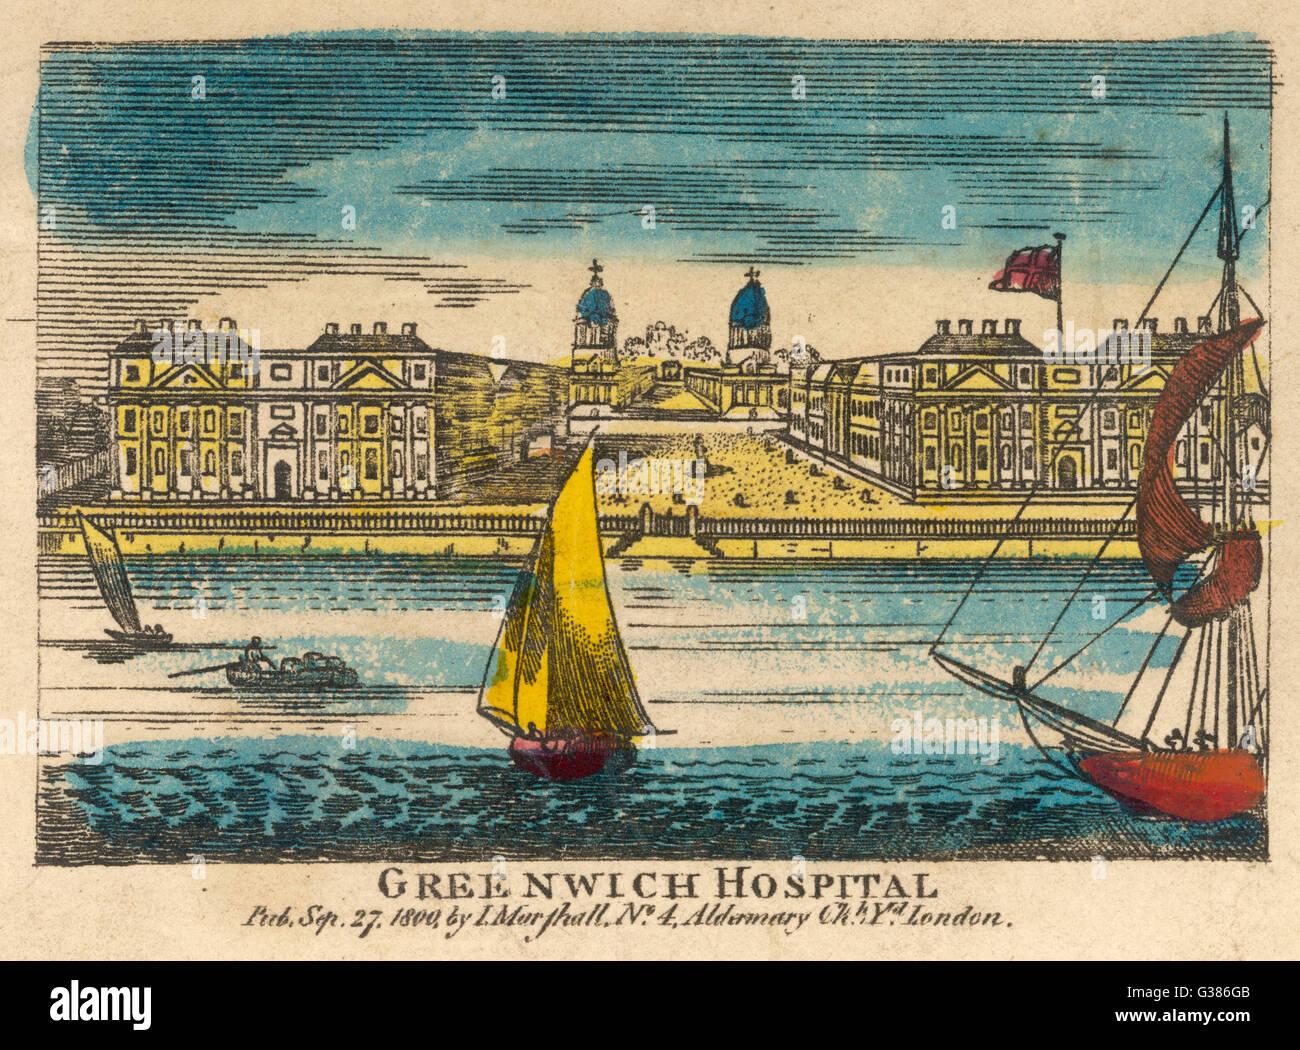 Greenwich Hospital.          Date: 1800 - Stock Image